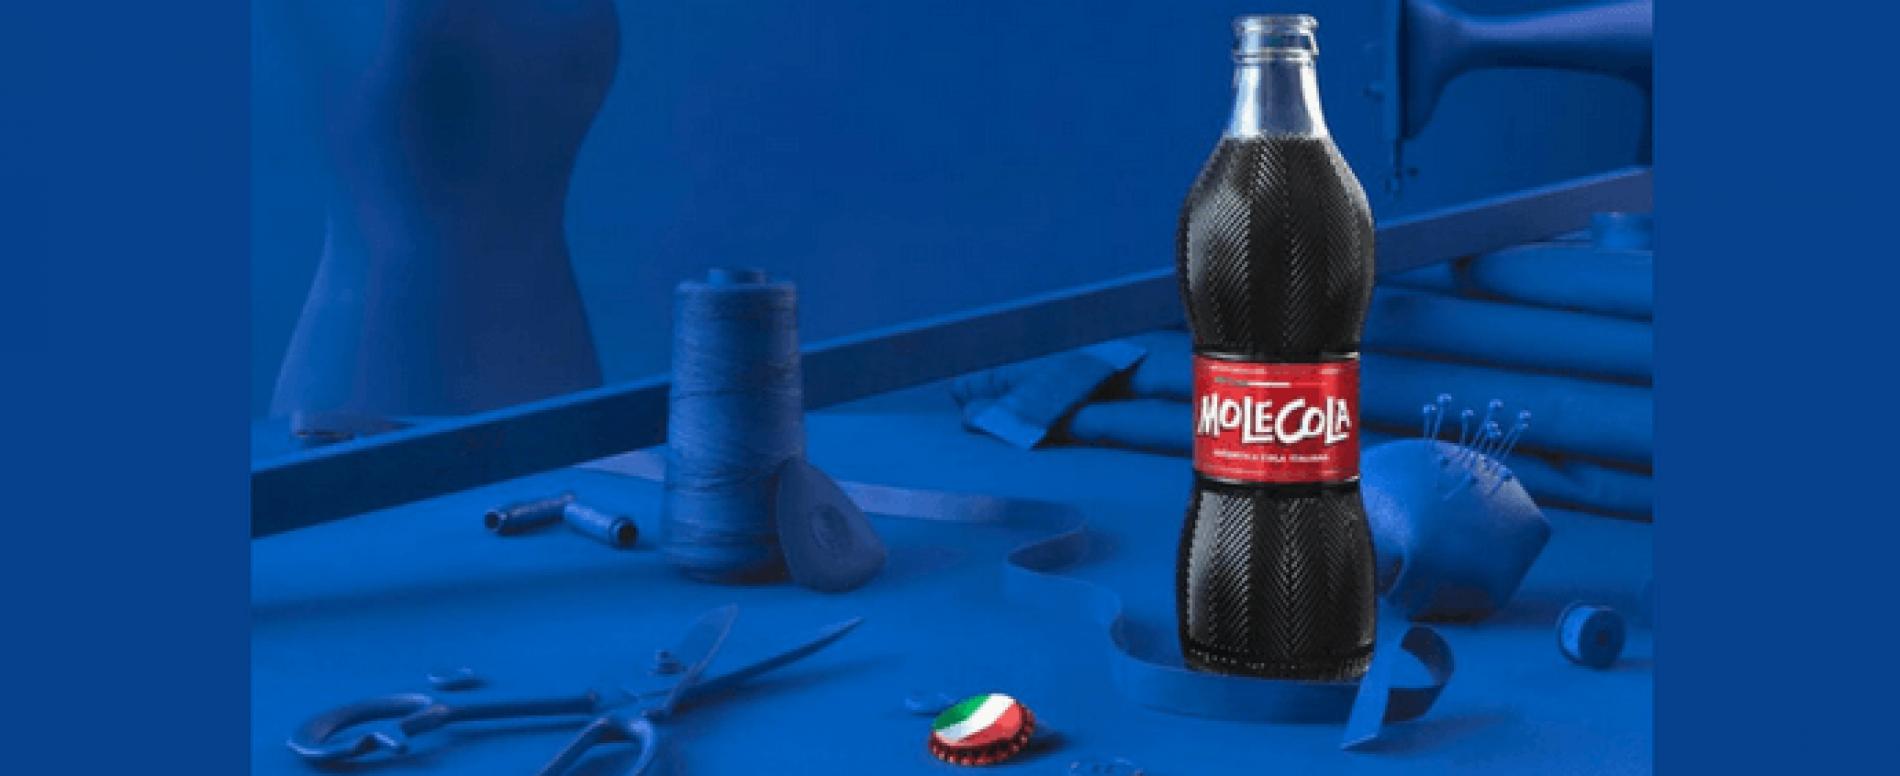 "Molecola lancia la nuova bottiglia ""90.60.90"""